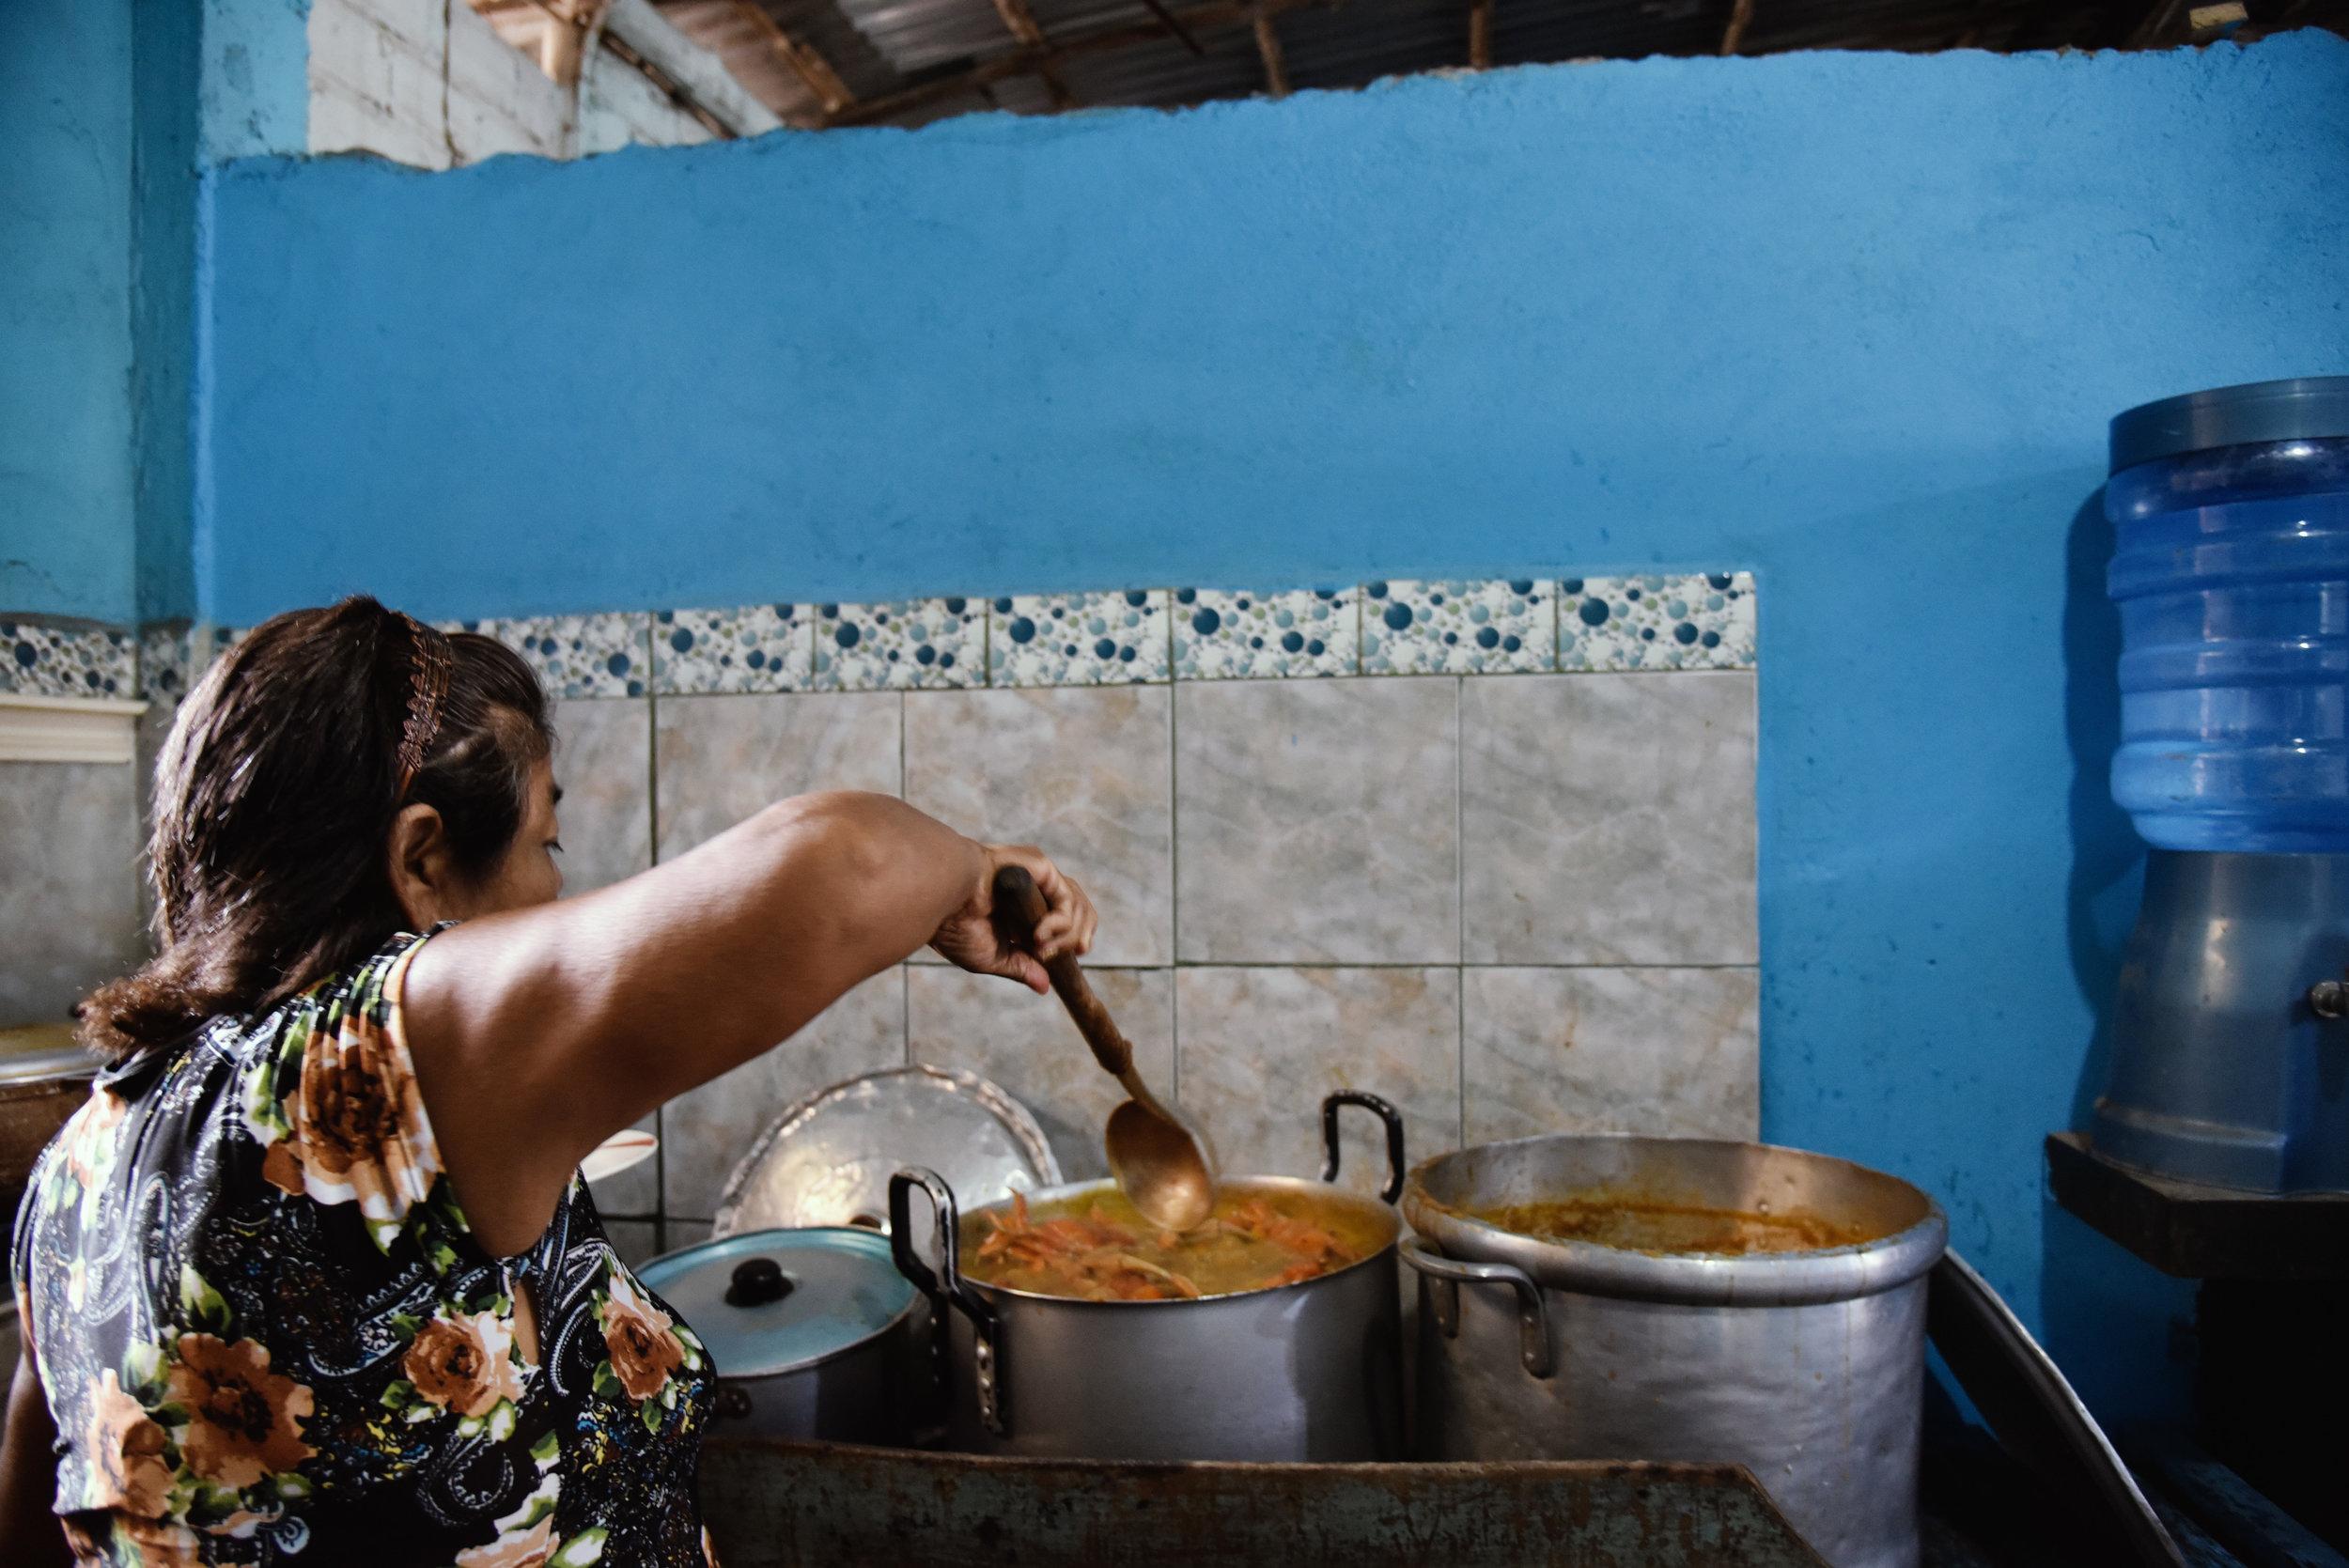 Adela en la Cocina//Adela in the Kitchen